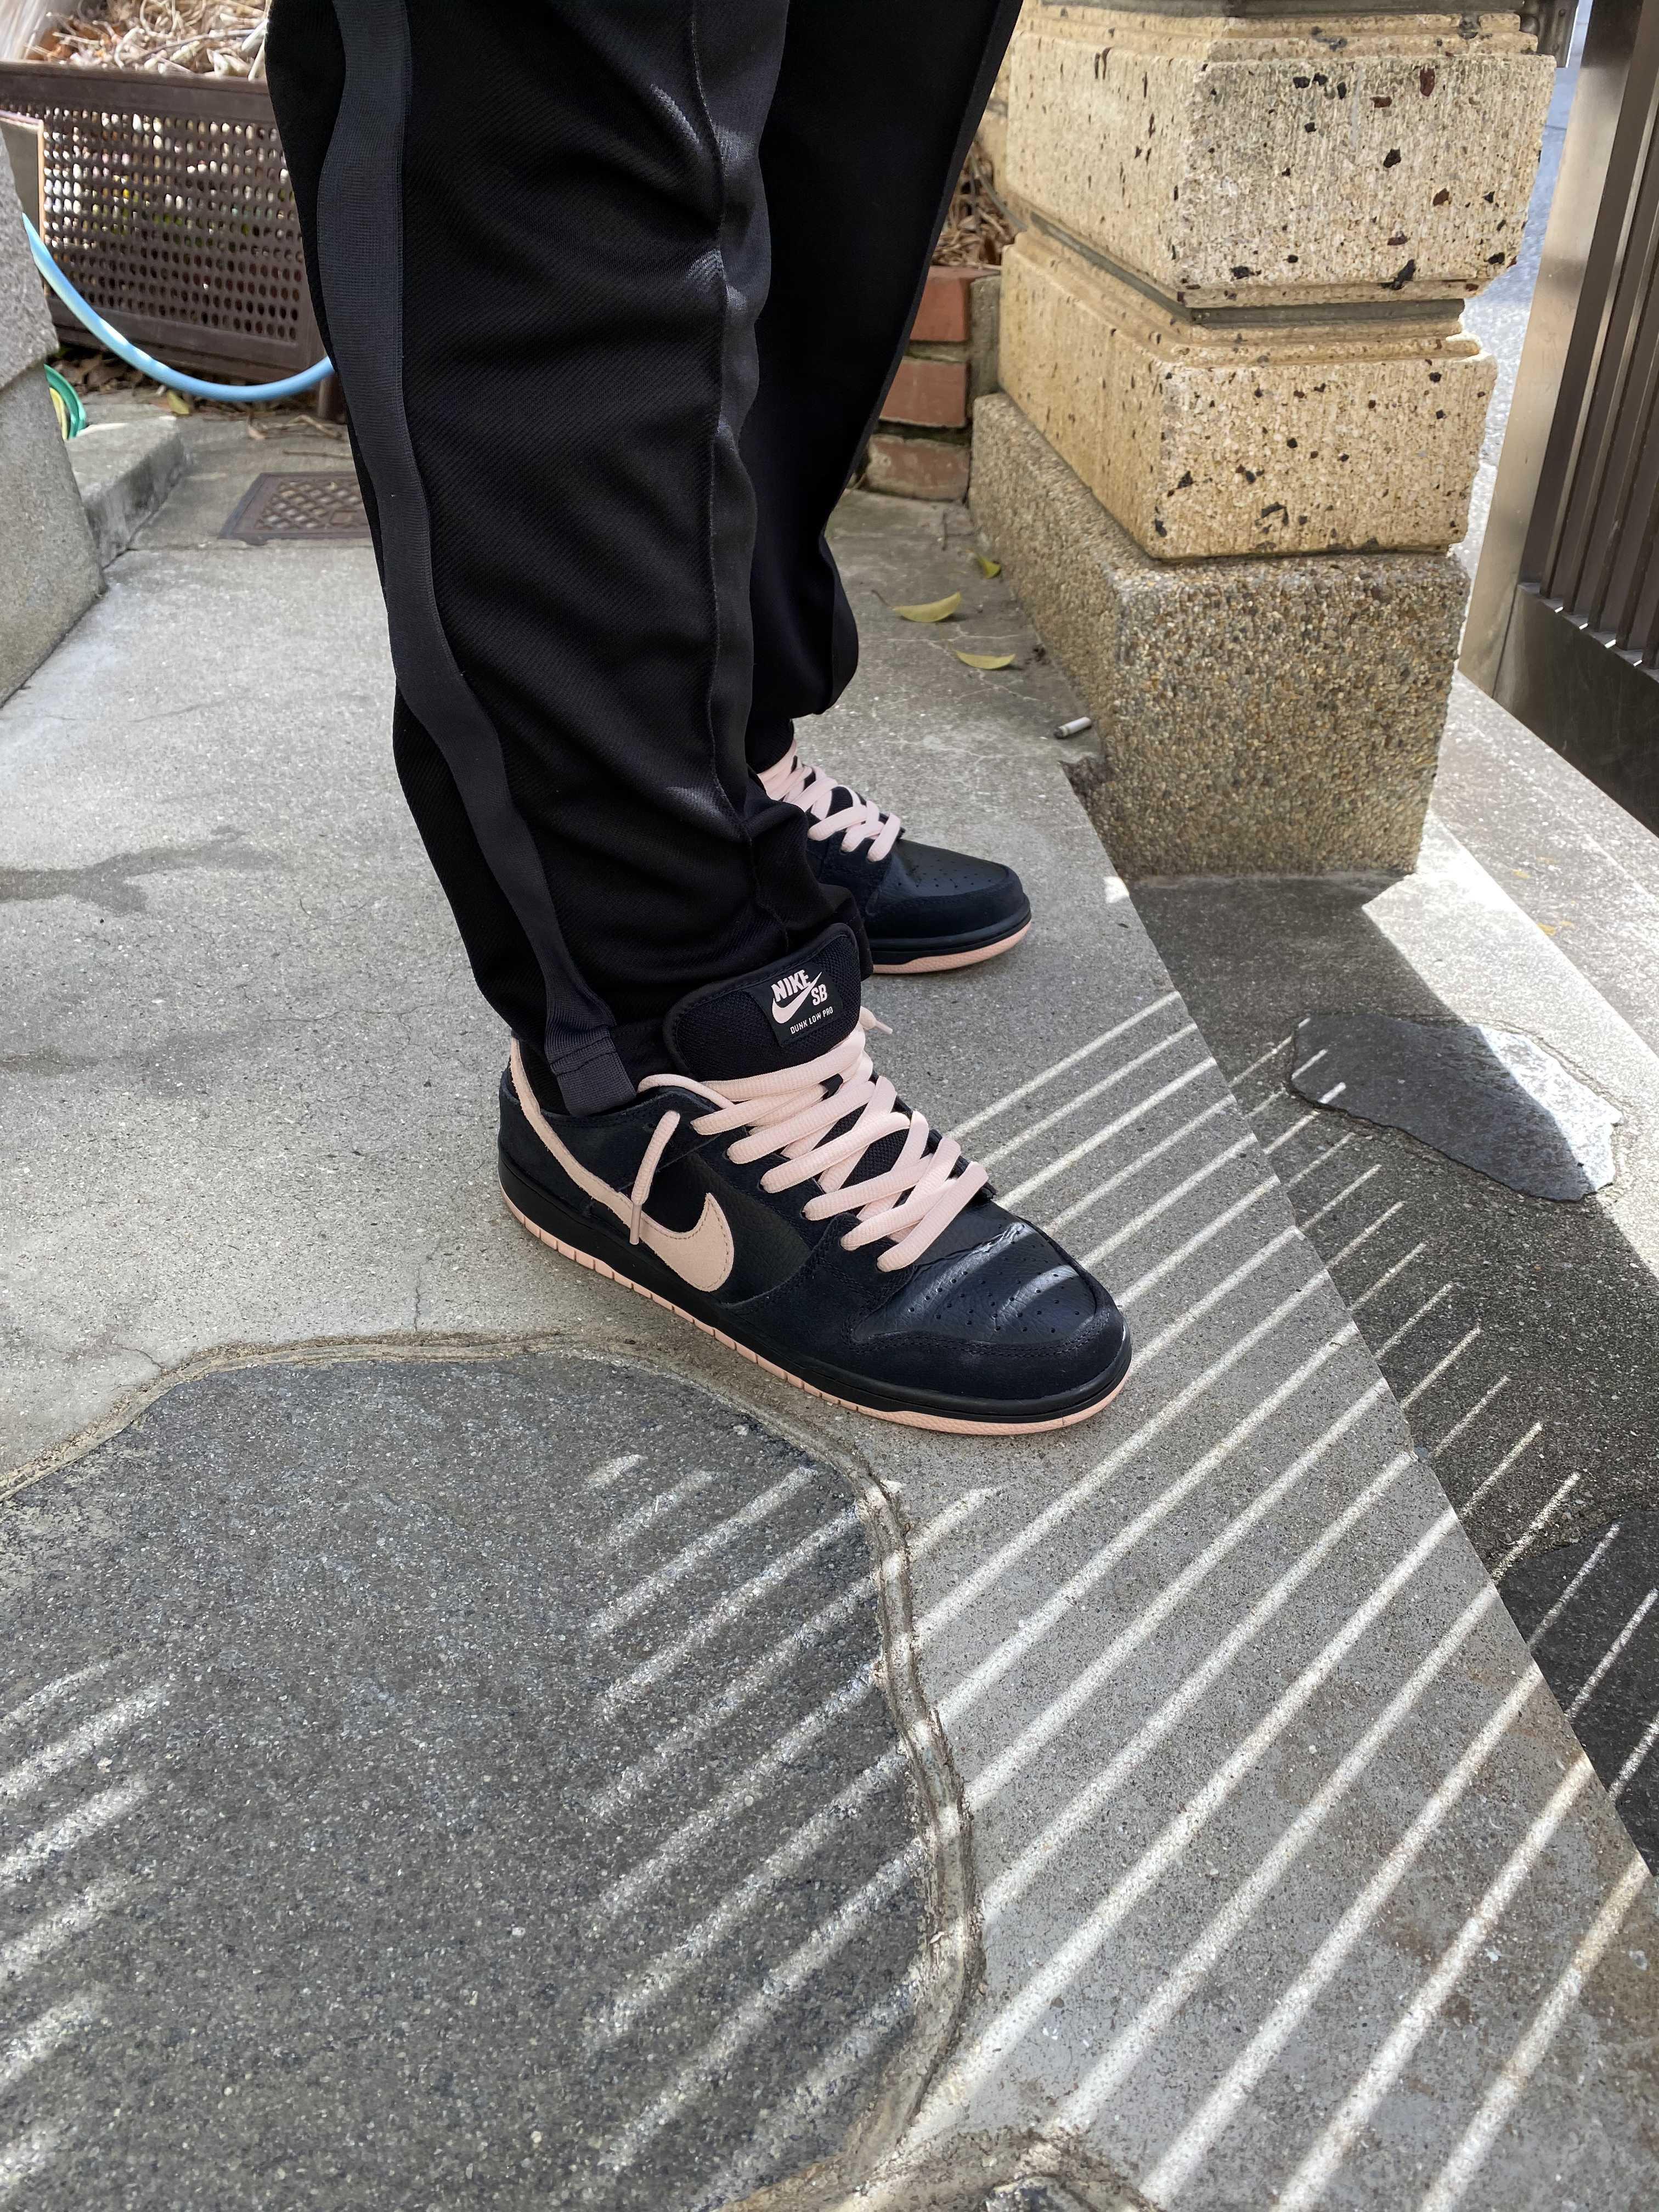 Nike sb dunk low pro pink devil